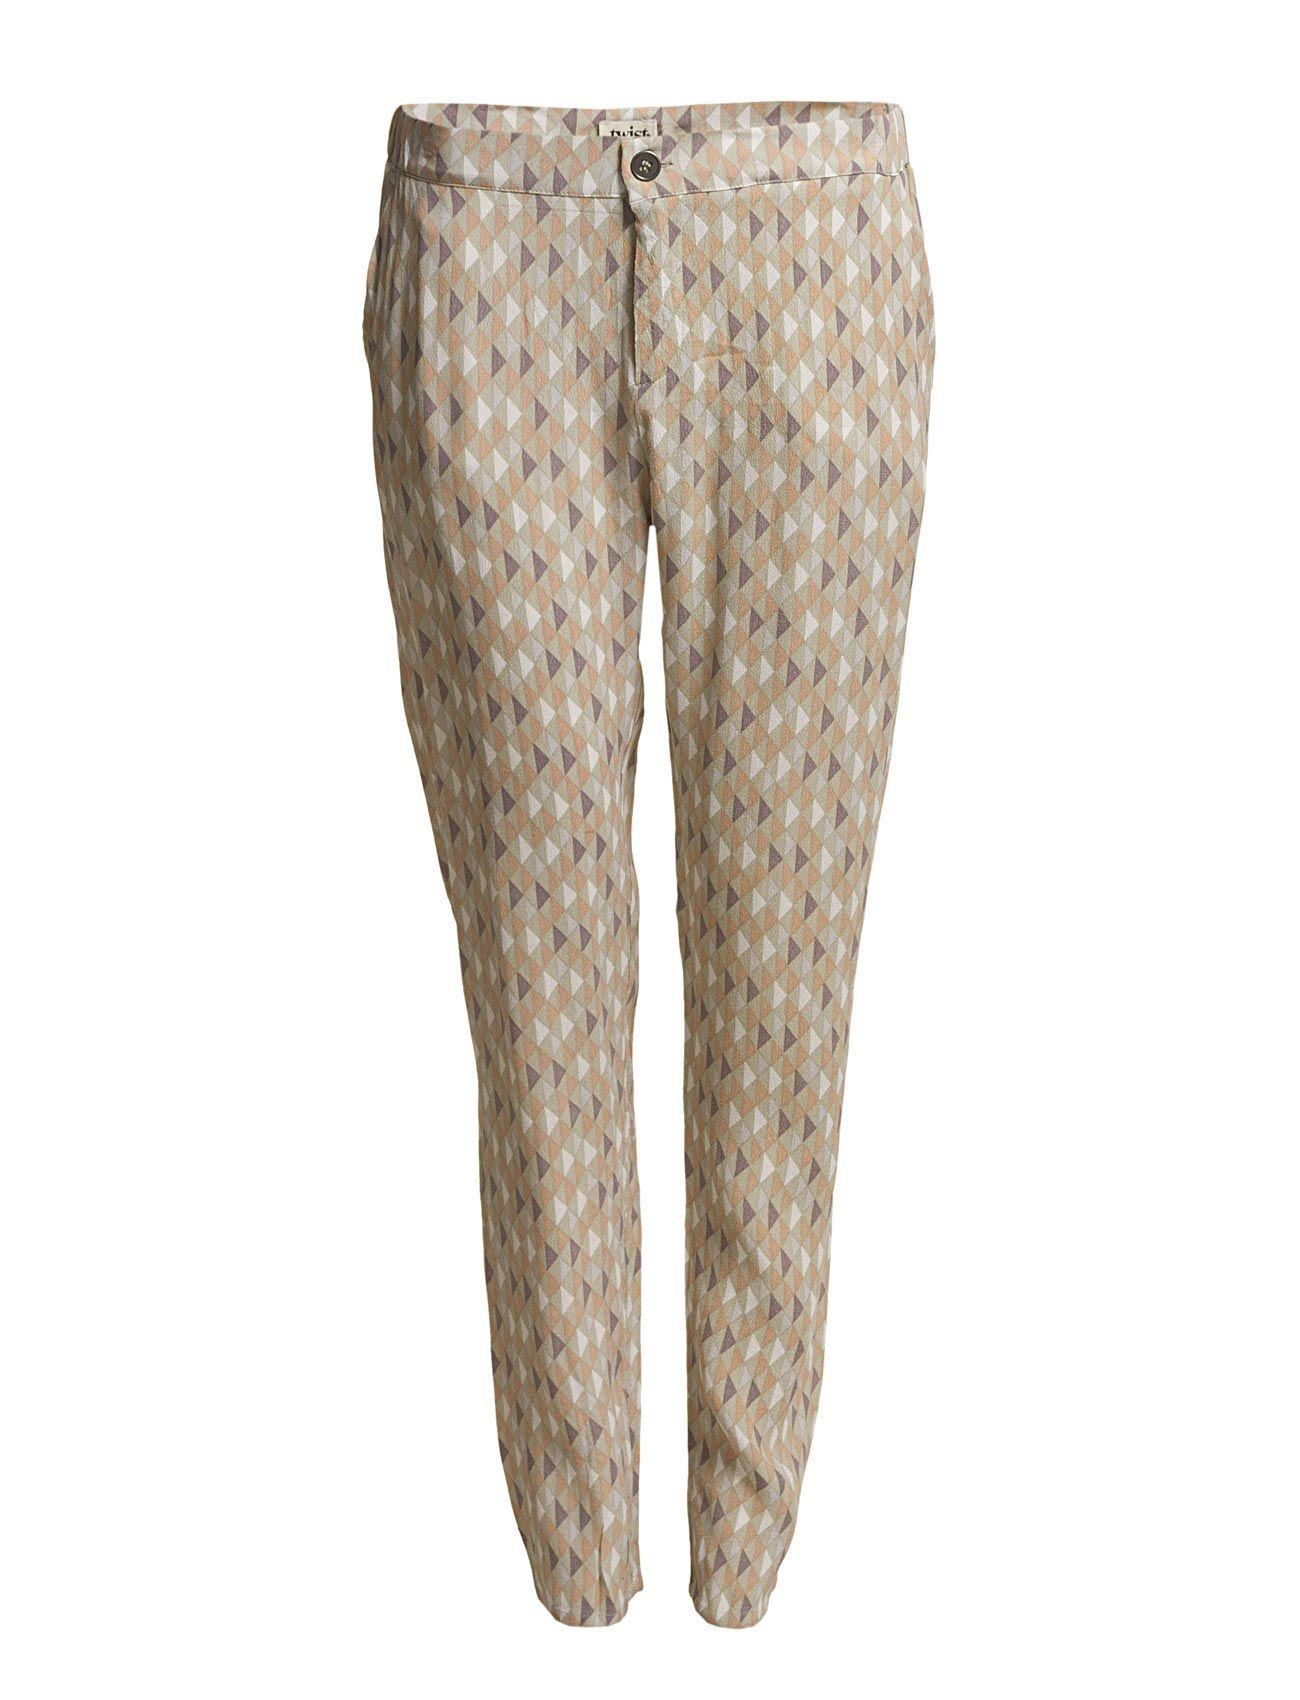 Randi Trousers